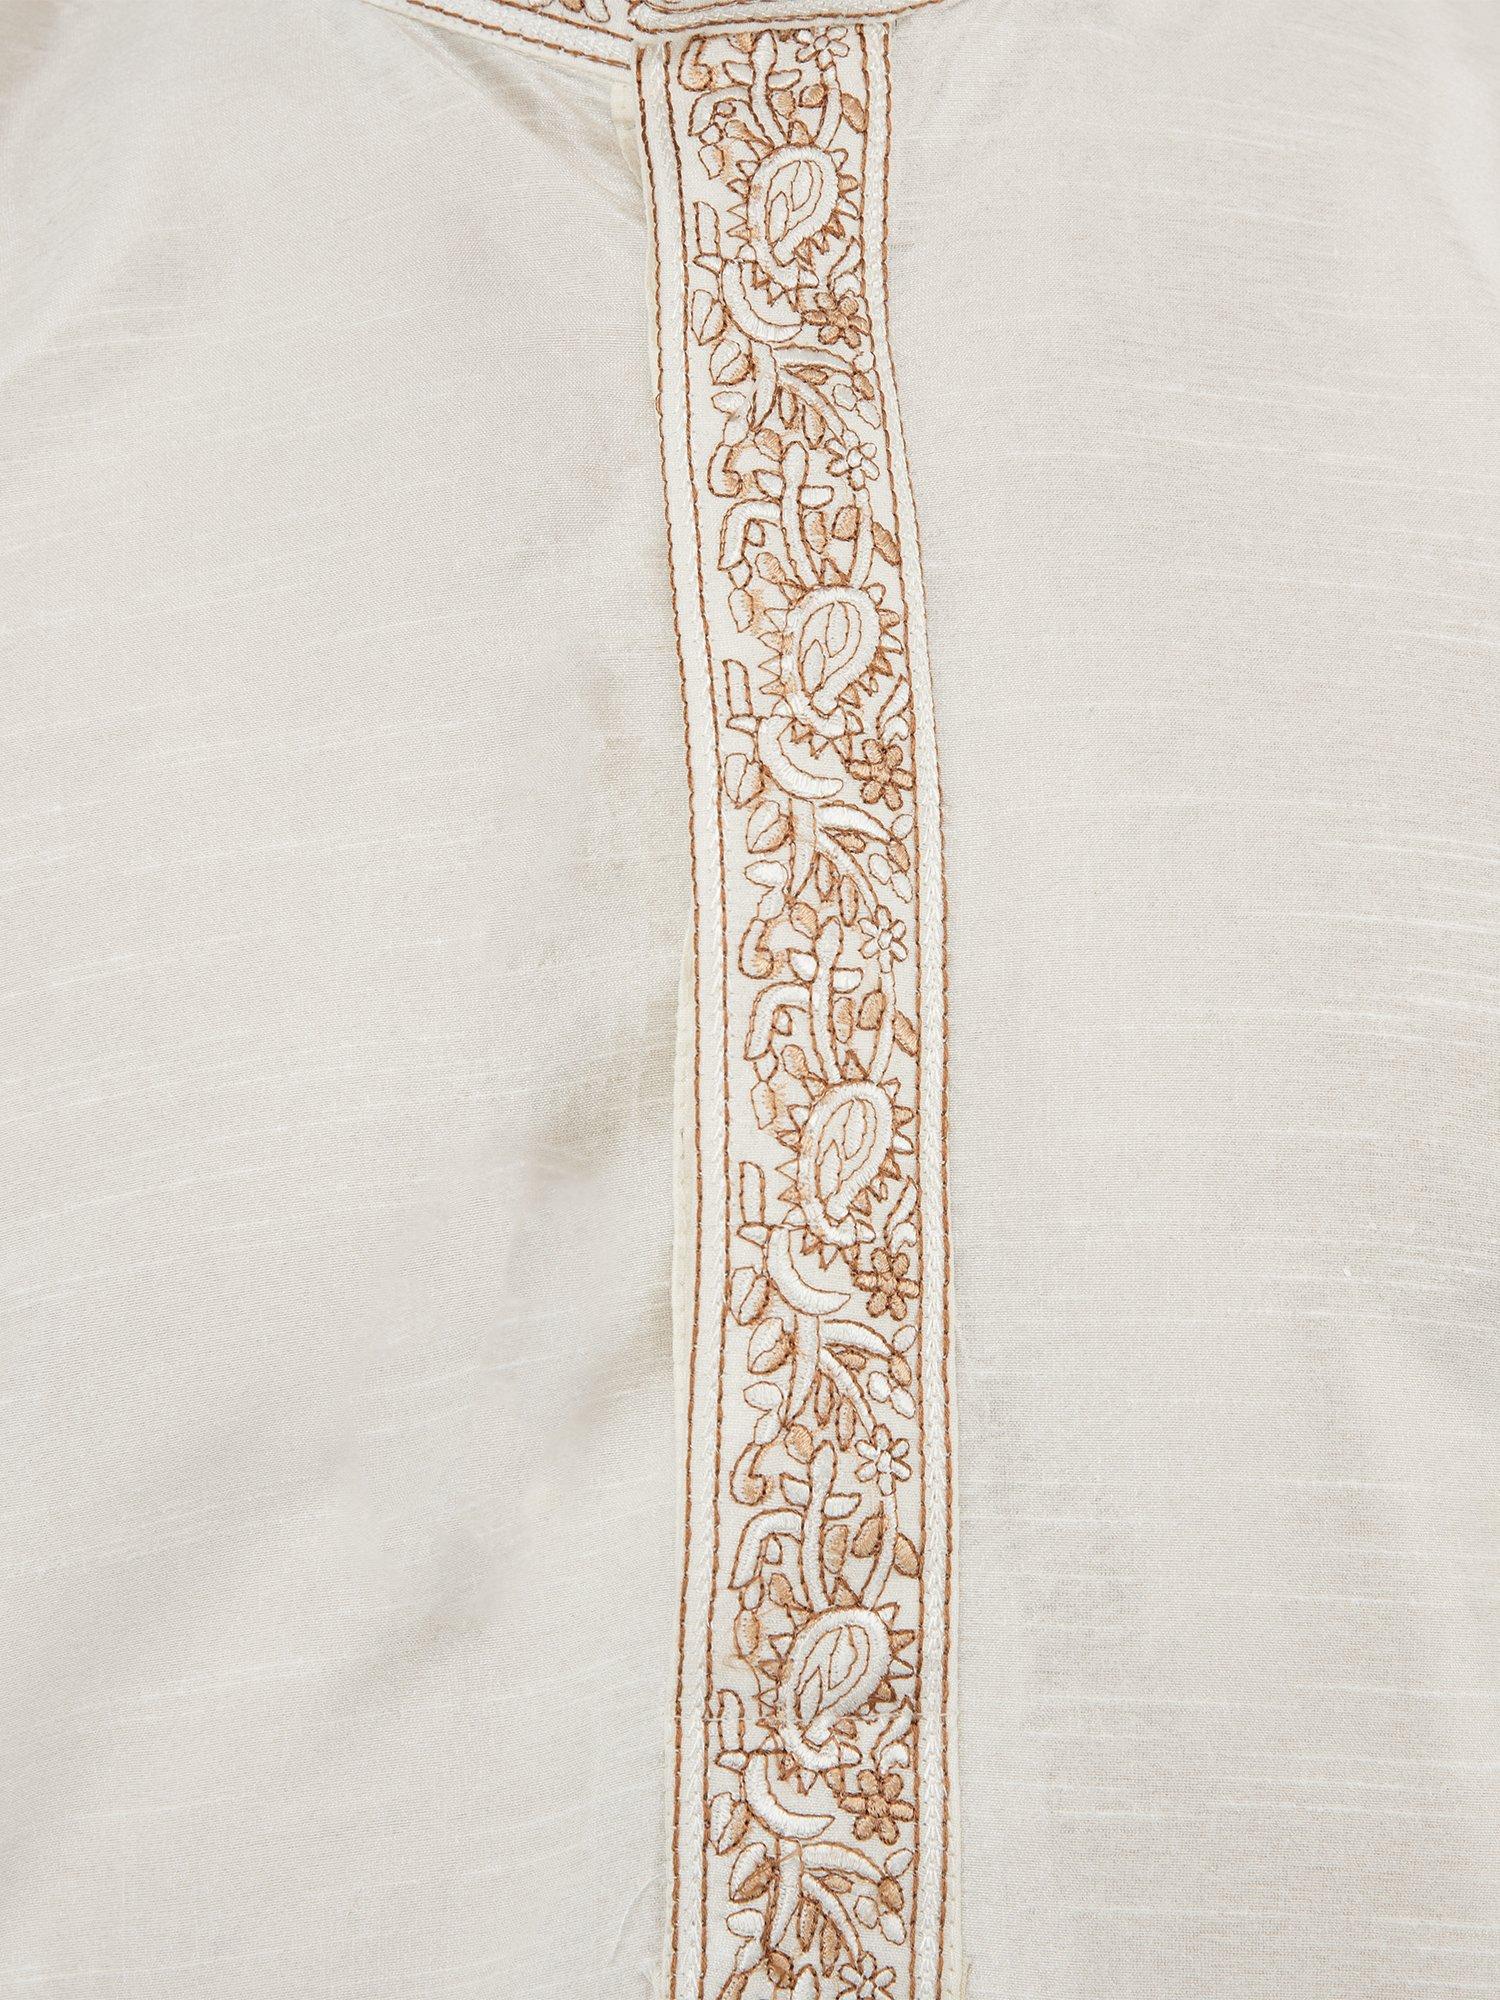 Long Sleeve Button Down Shirt Mens Kurta Pajamas Set Handmade Traditional Indian Costume Offwhite -M by SKAVIJ (Image #2)